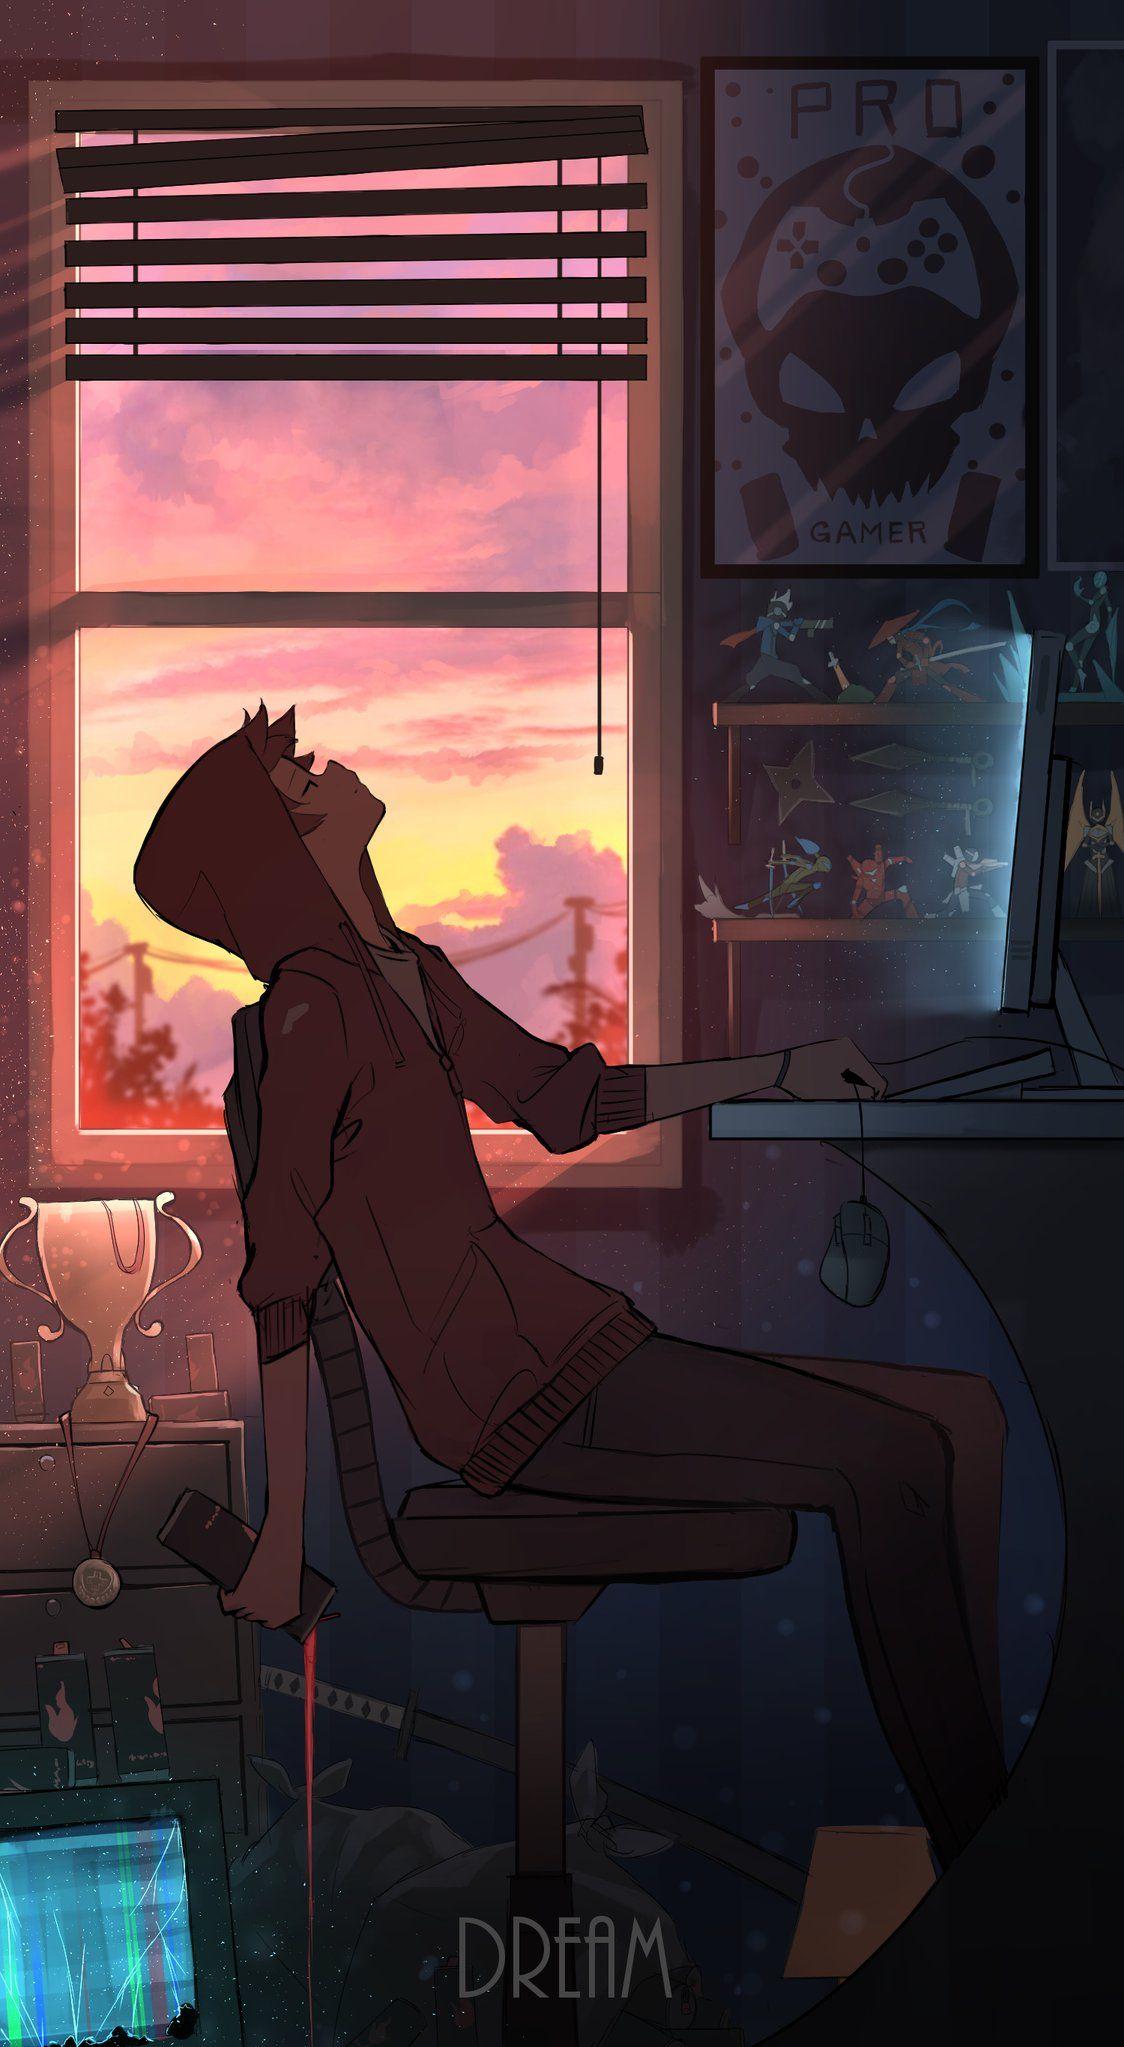 Pasoputi On Twitter Anime Scenery Anime Backgrounds Wallpapers Anime Scenery Wallpaper